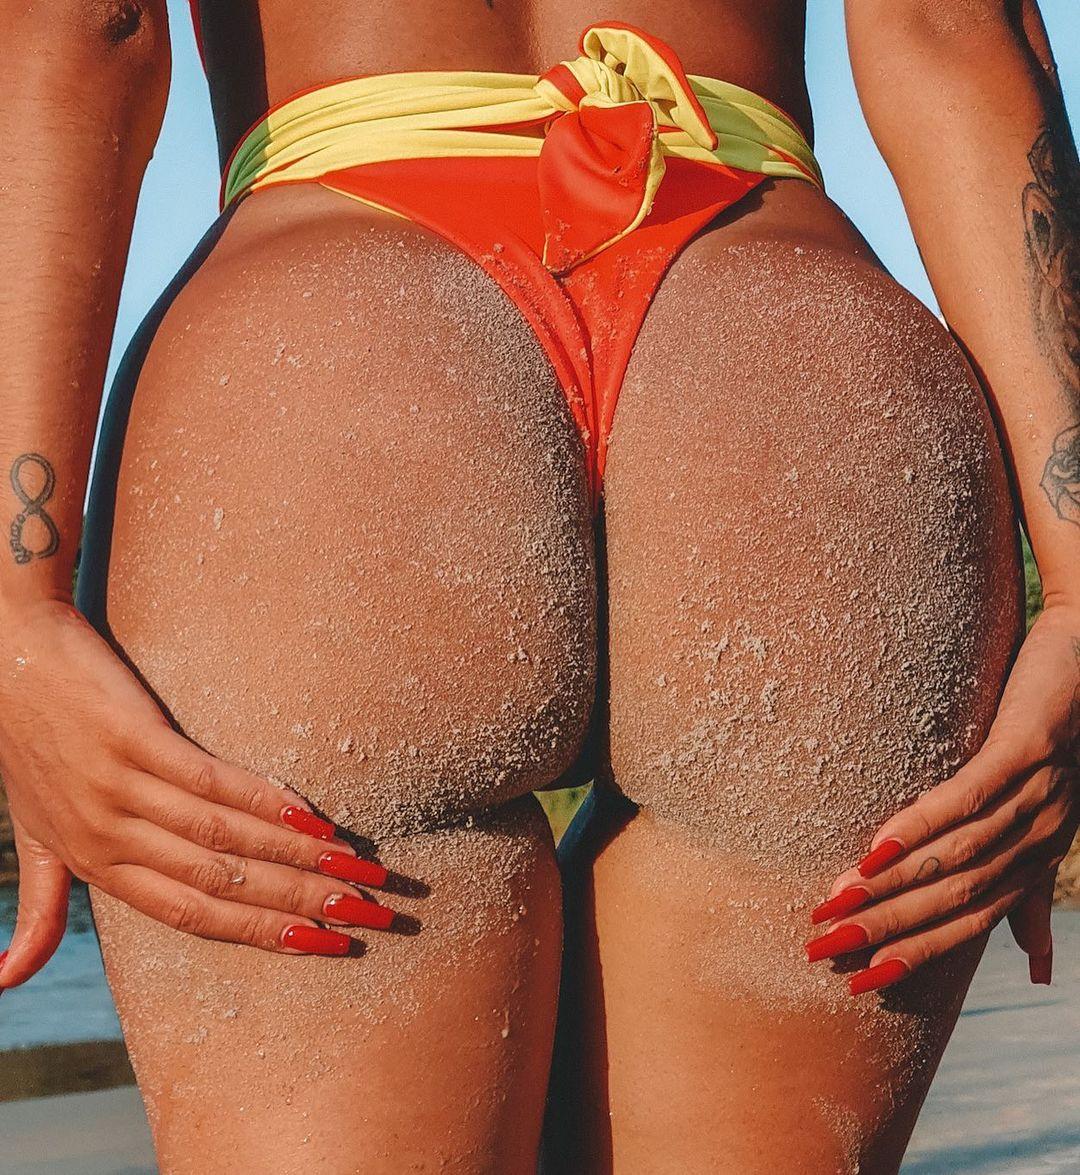 Camila Beck representa o Tocantins no Miss Bumbum 2021